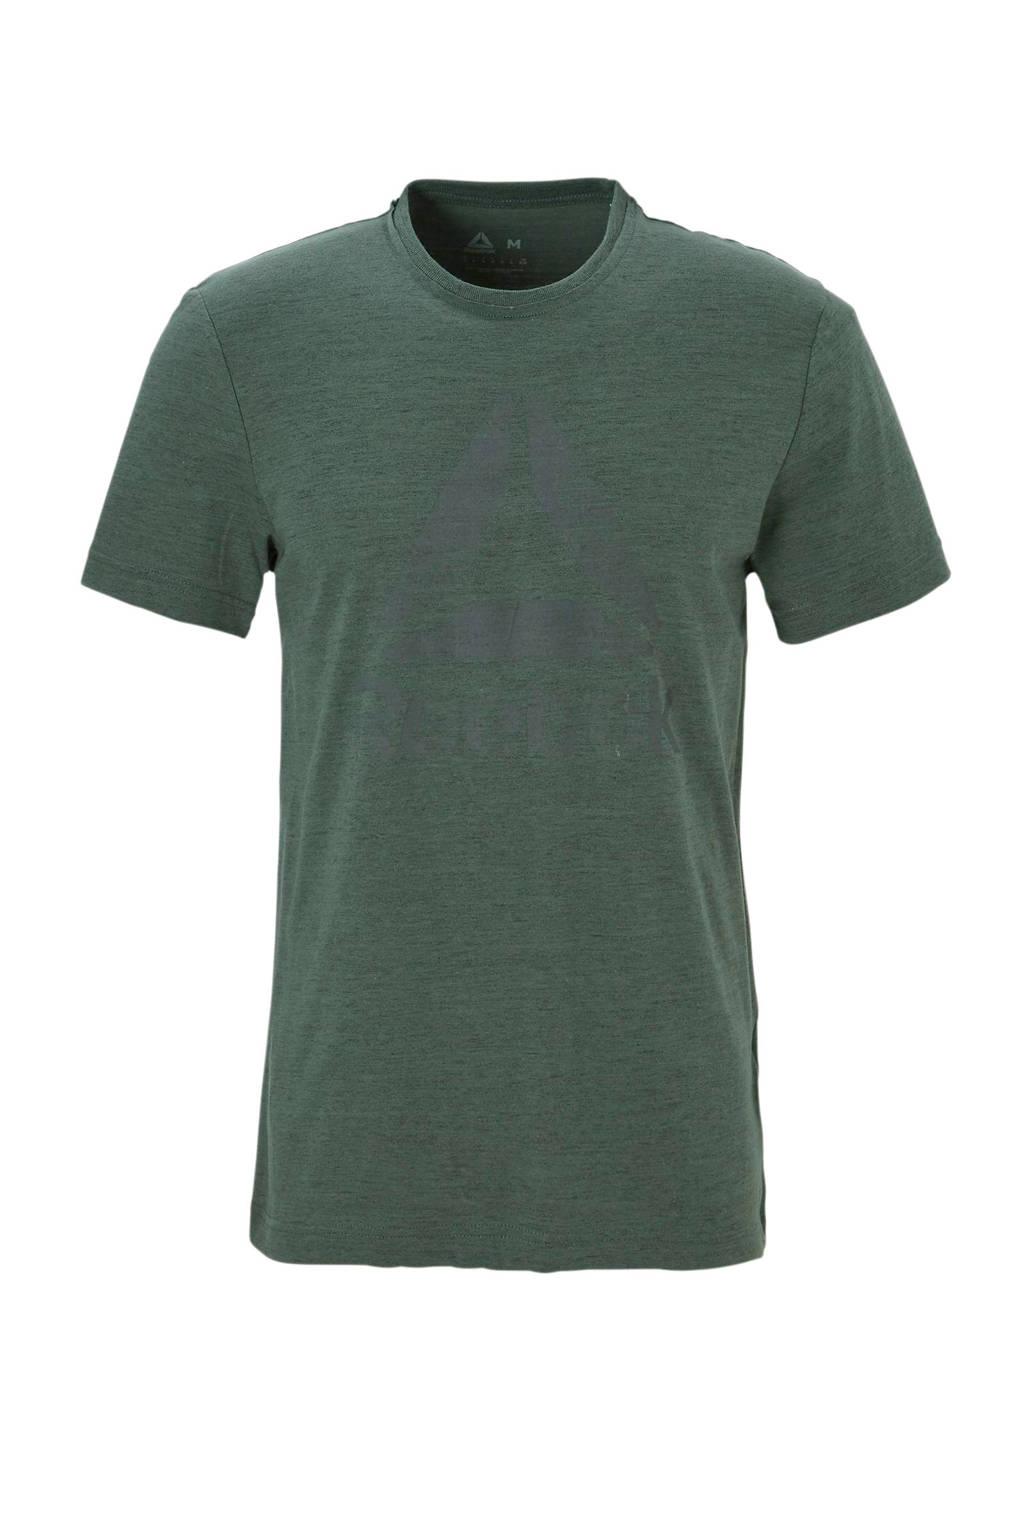 Reebok   sport T-shirt donkergroen, Donkergroen